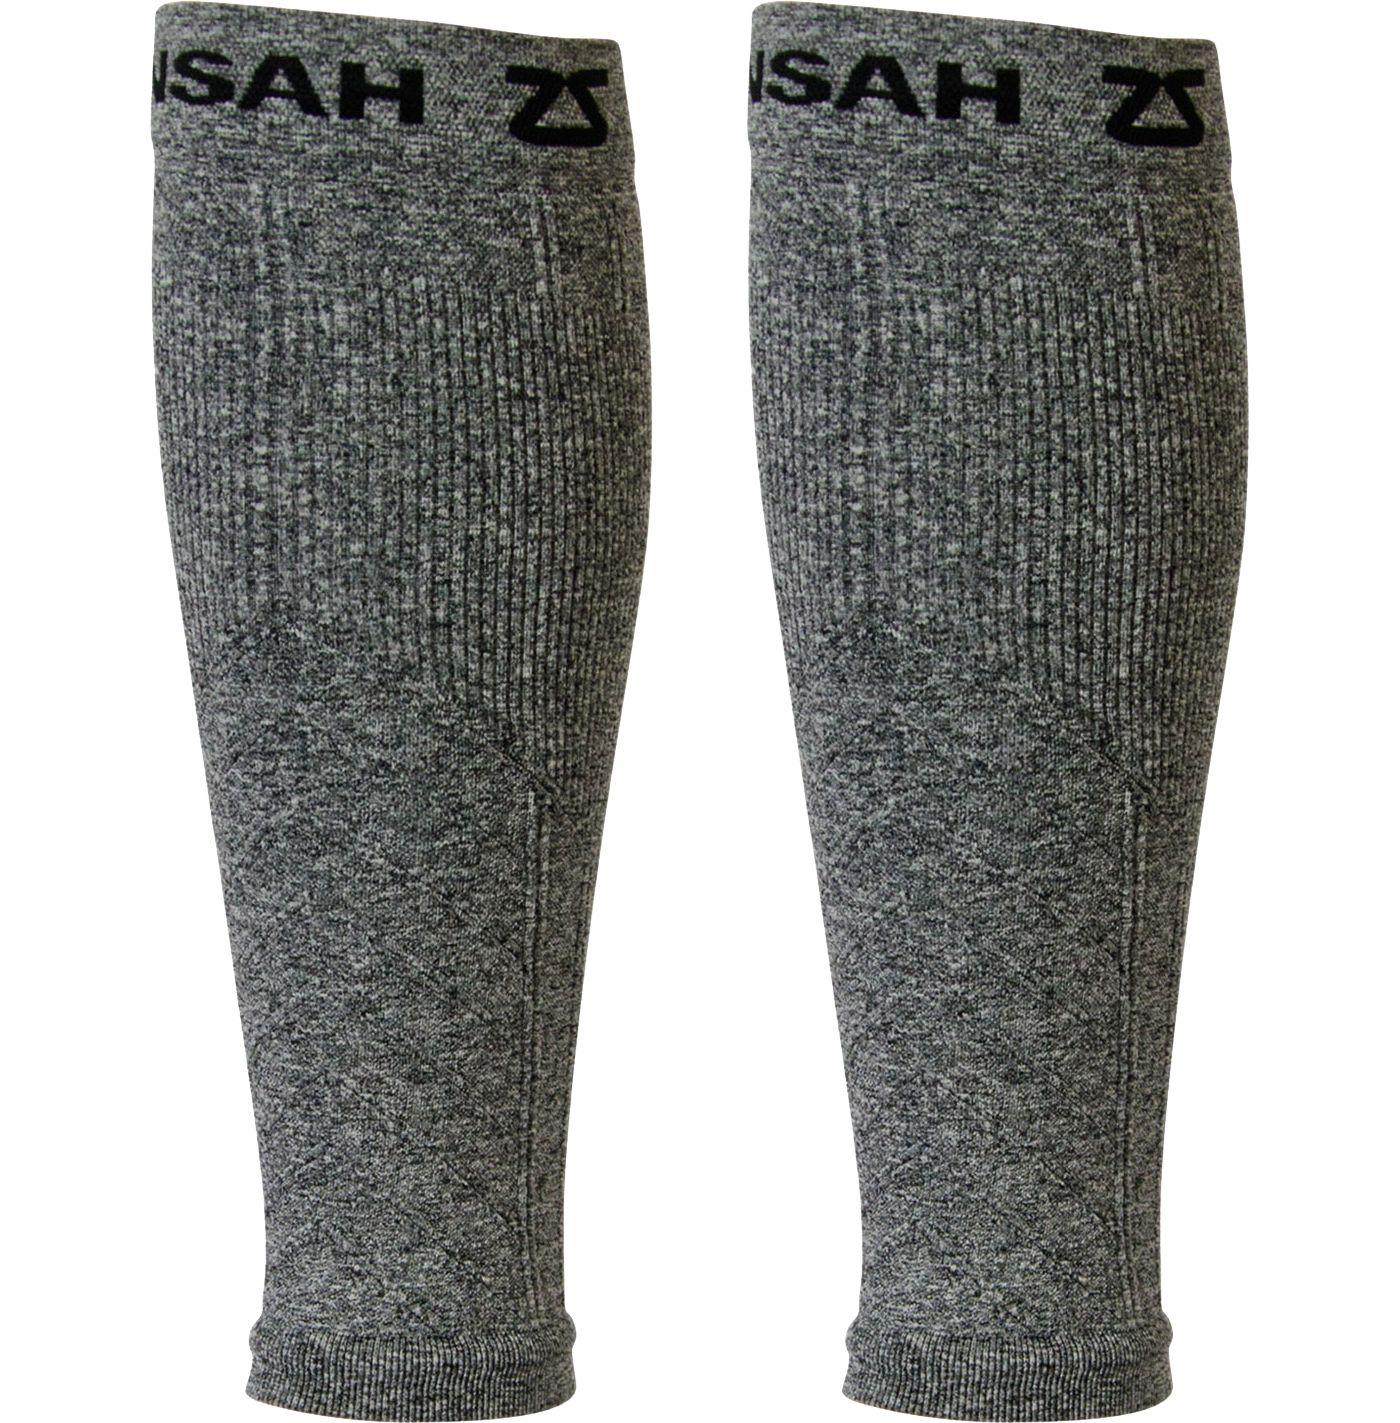 Zensah Compression Leg Sleeves